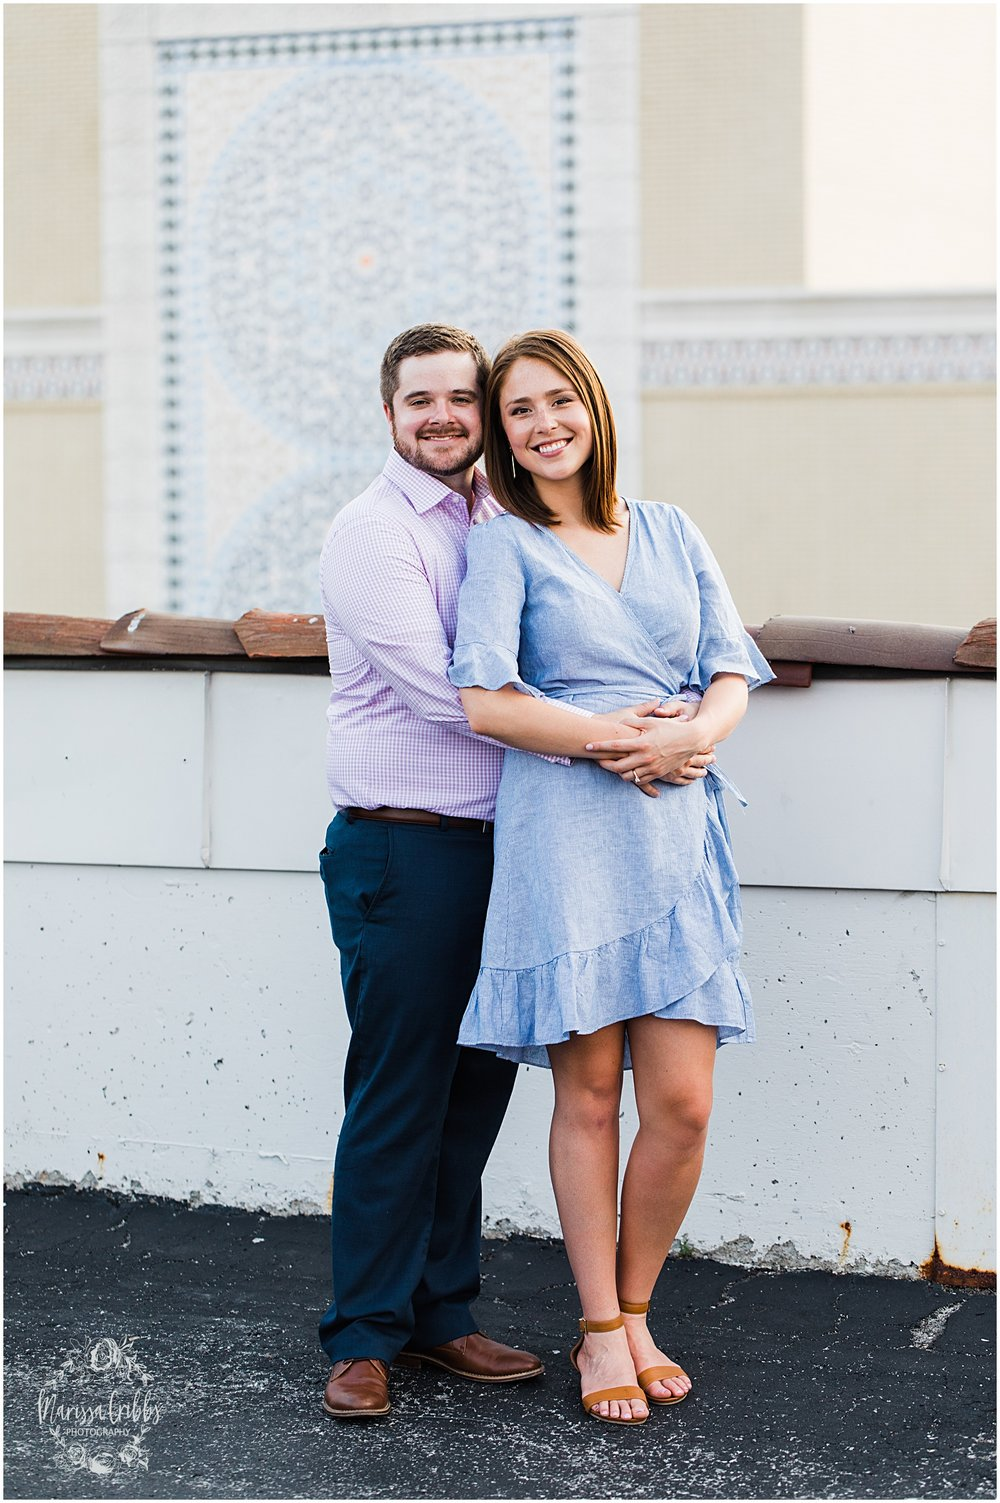 JESSICA & MARK ENGAGED - MARISSA CRIBBS PHOTOGRAPHY_5588.jpg